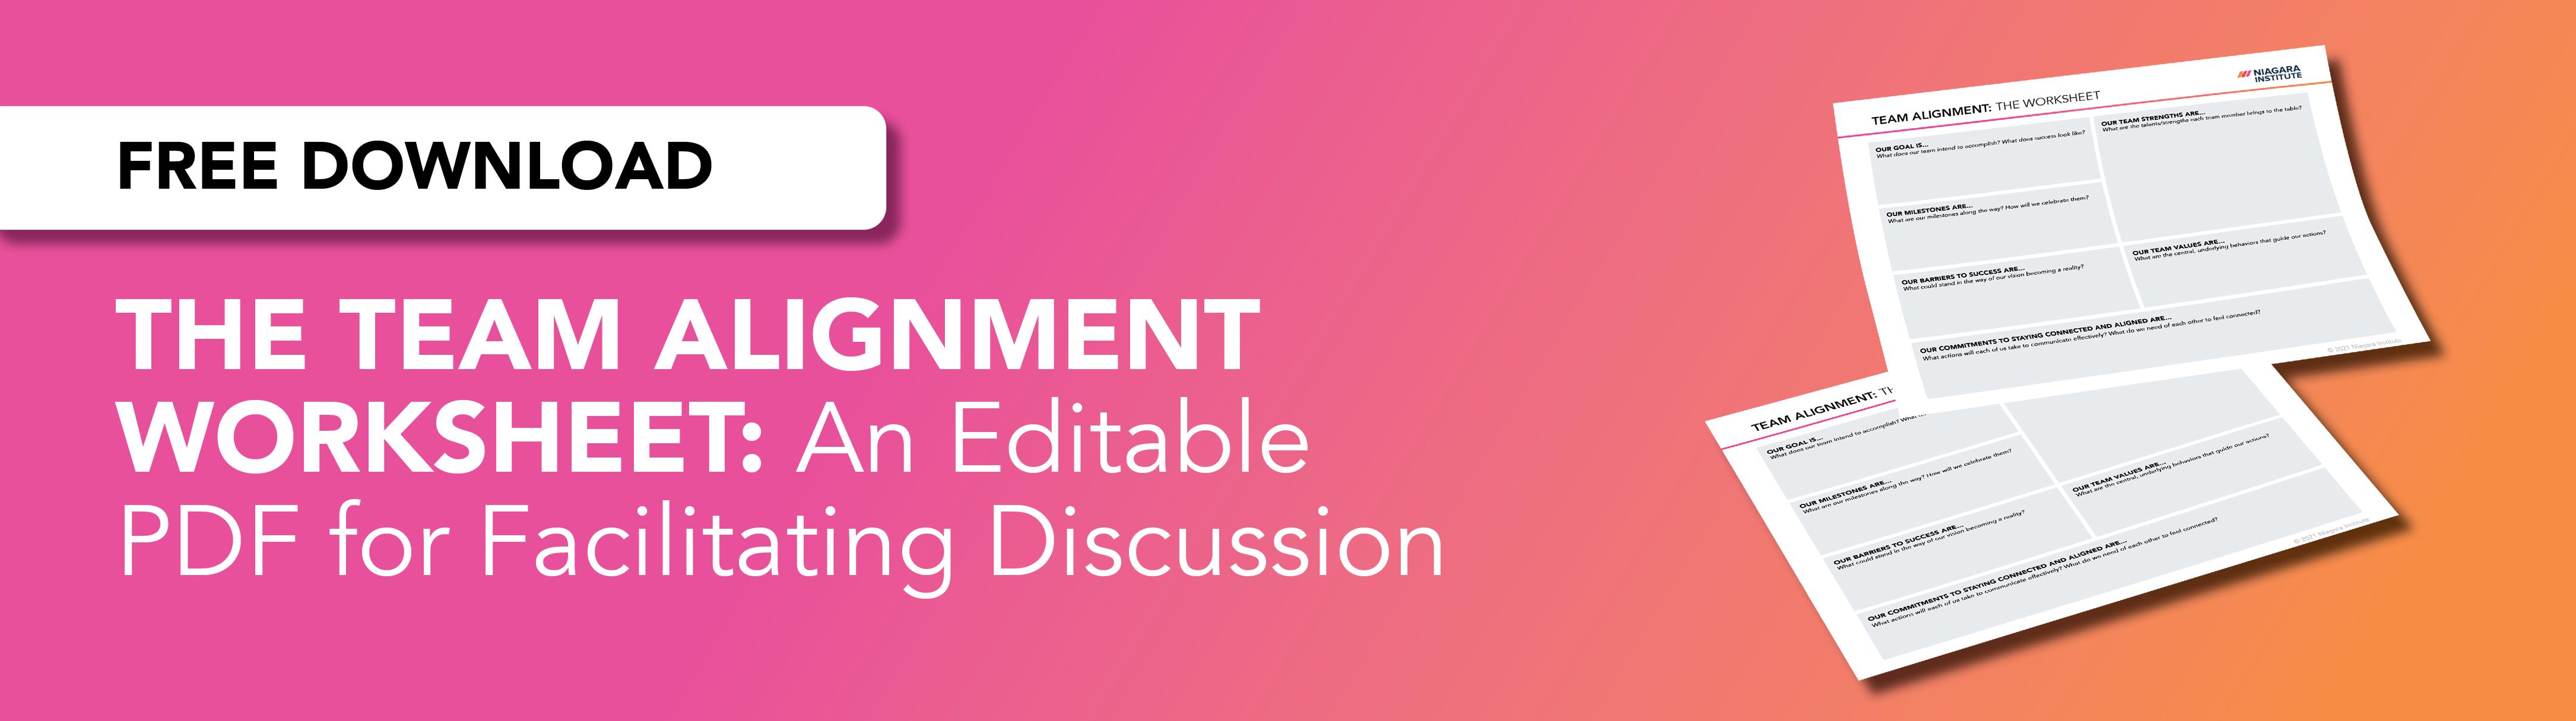 Editable team alignment worksheet